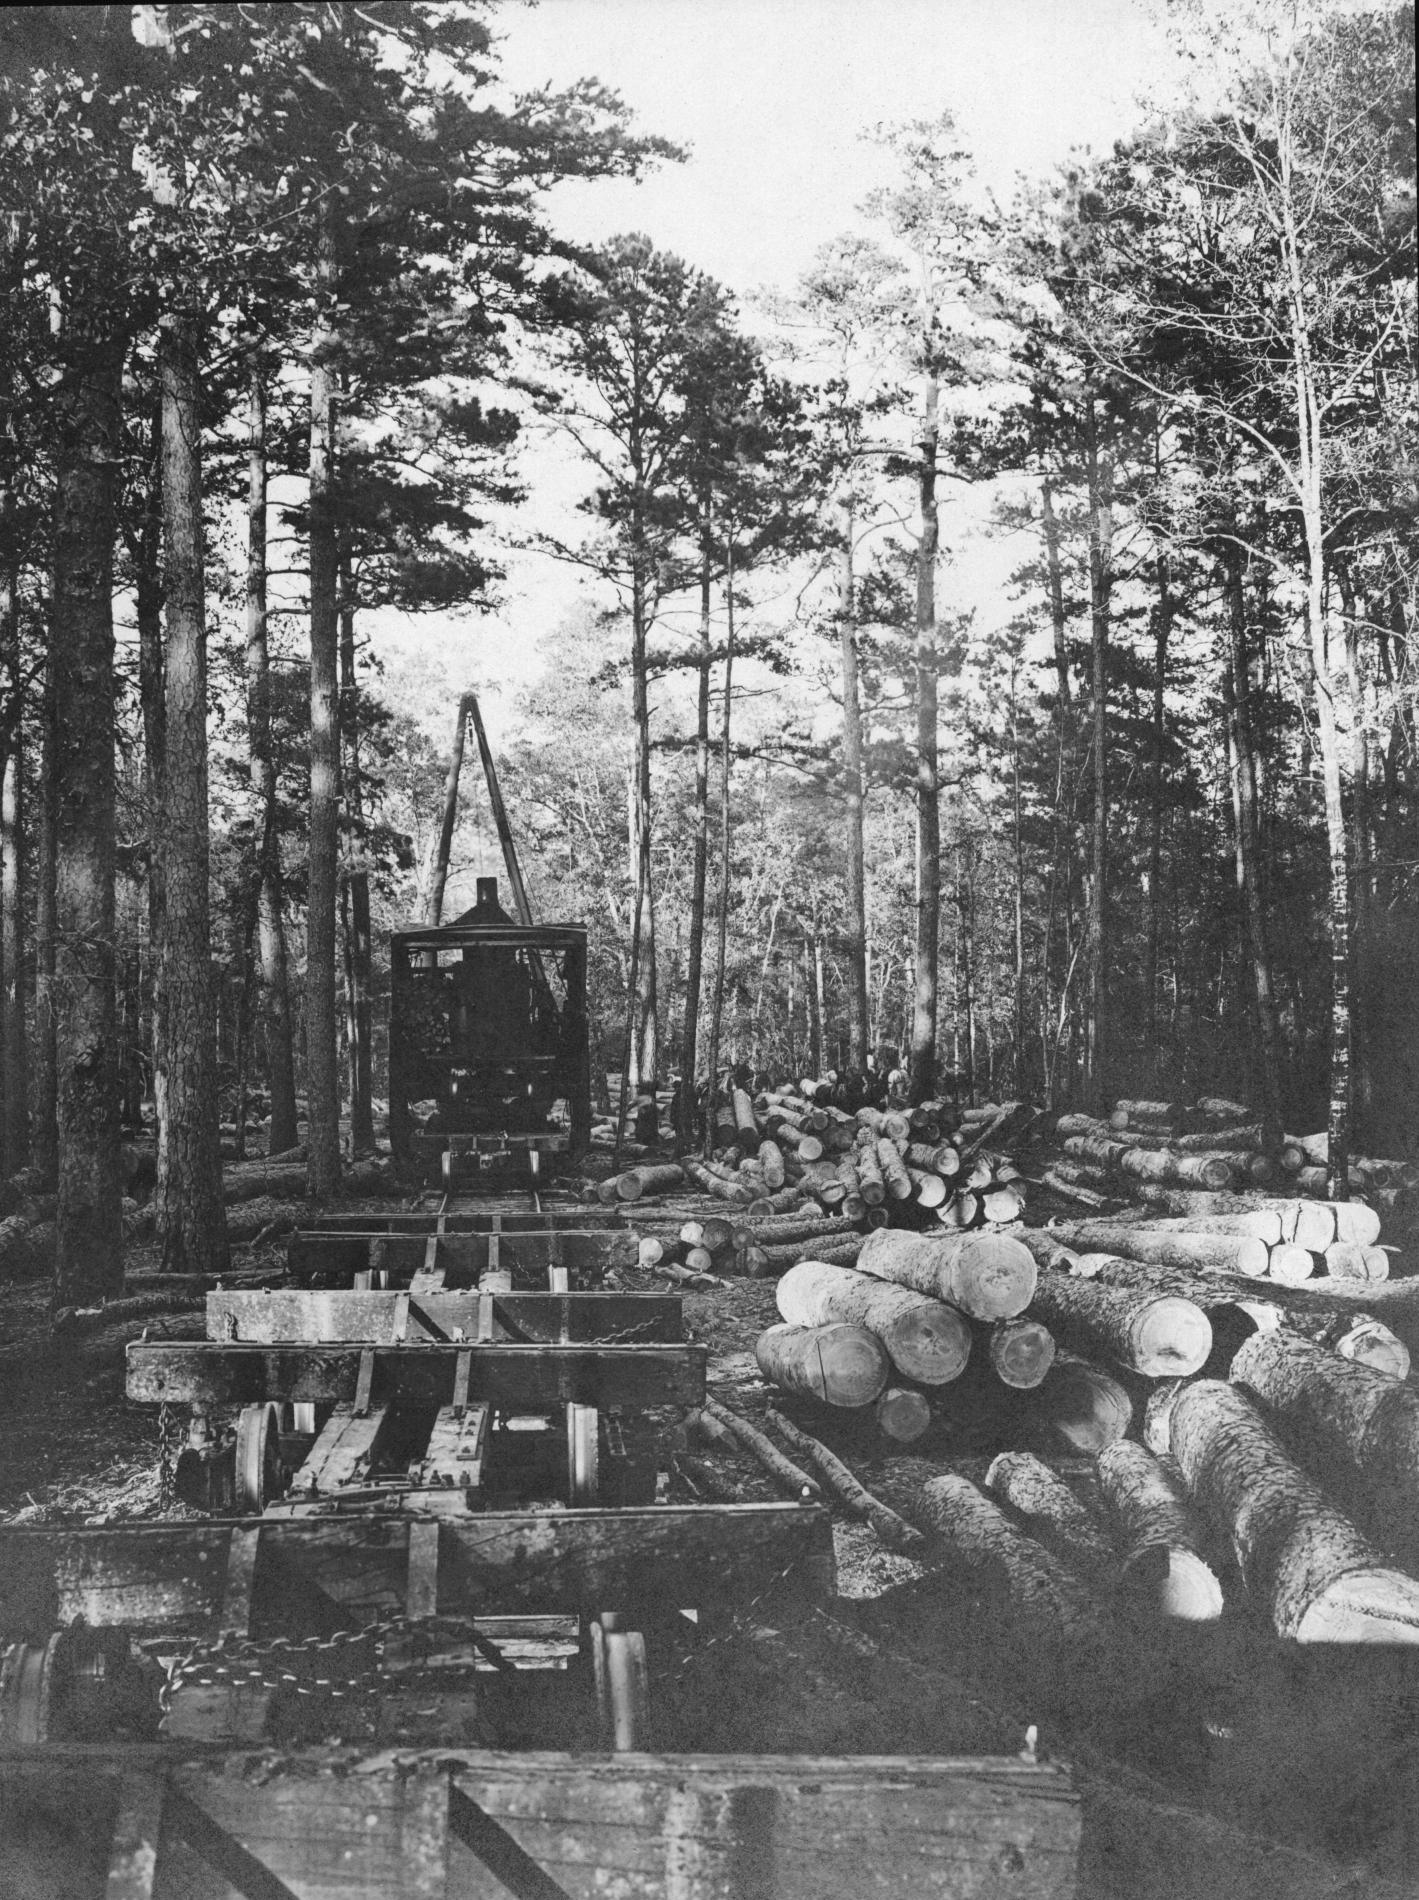 S. P. 324 McGiffert Loader and Pine Log Ramps